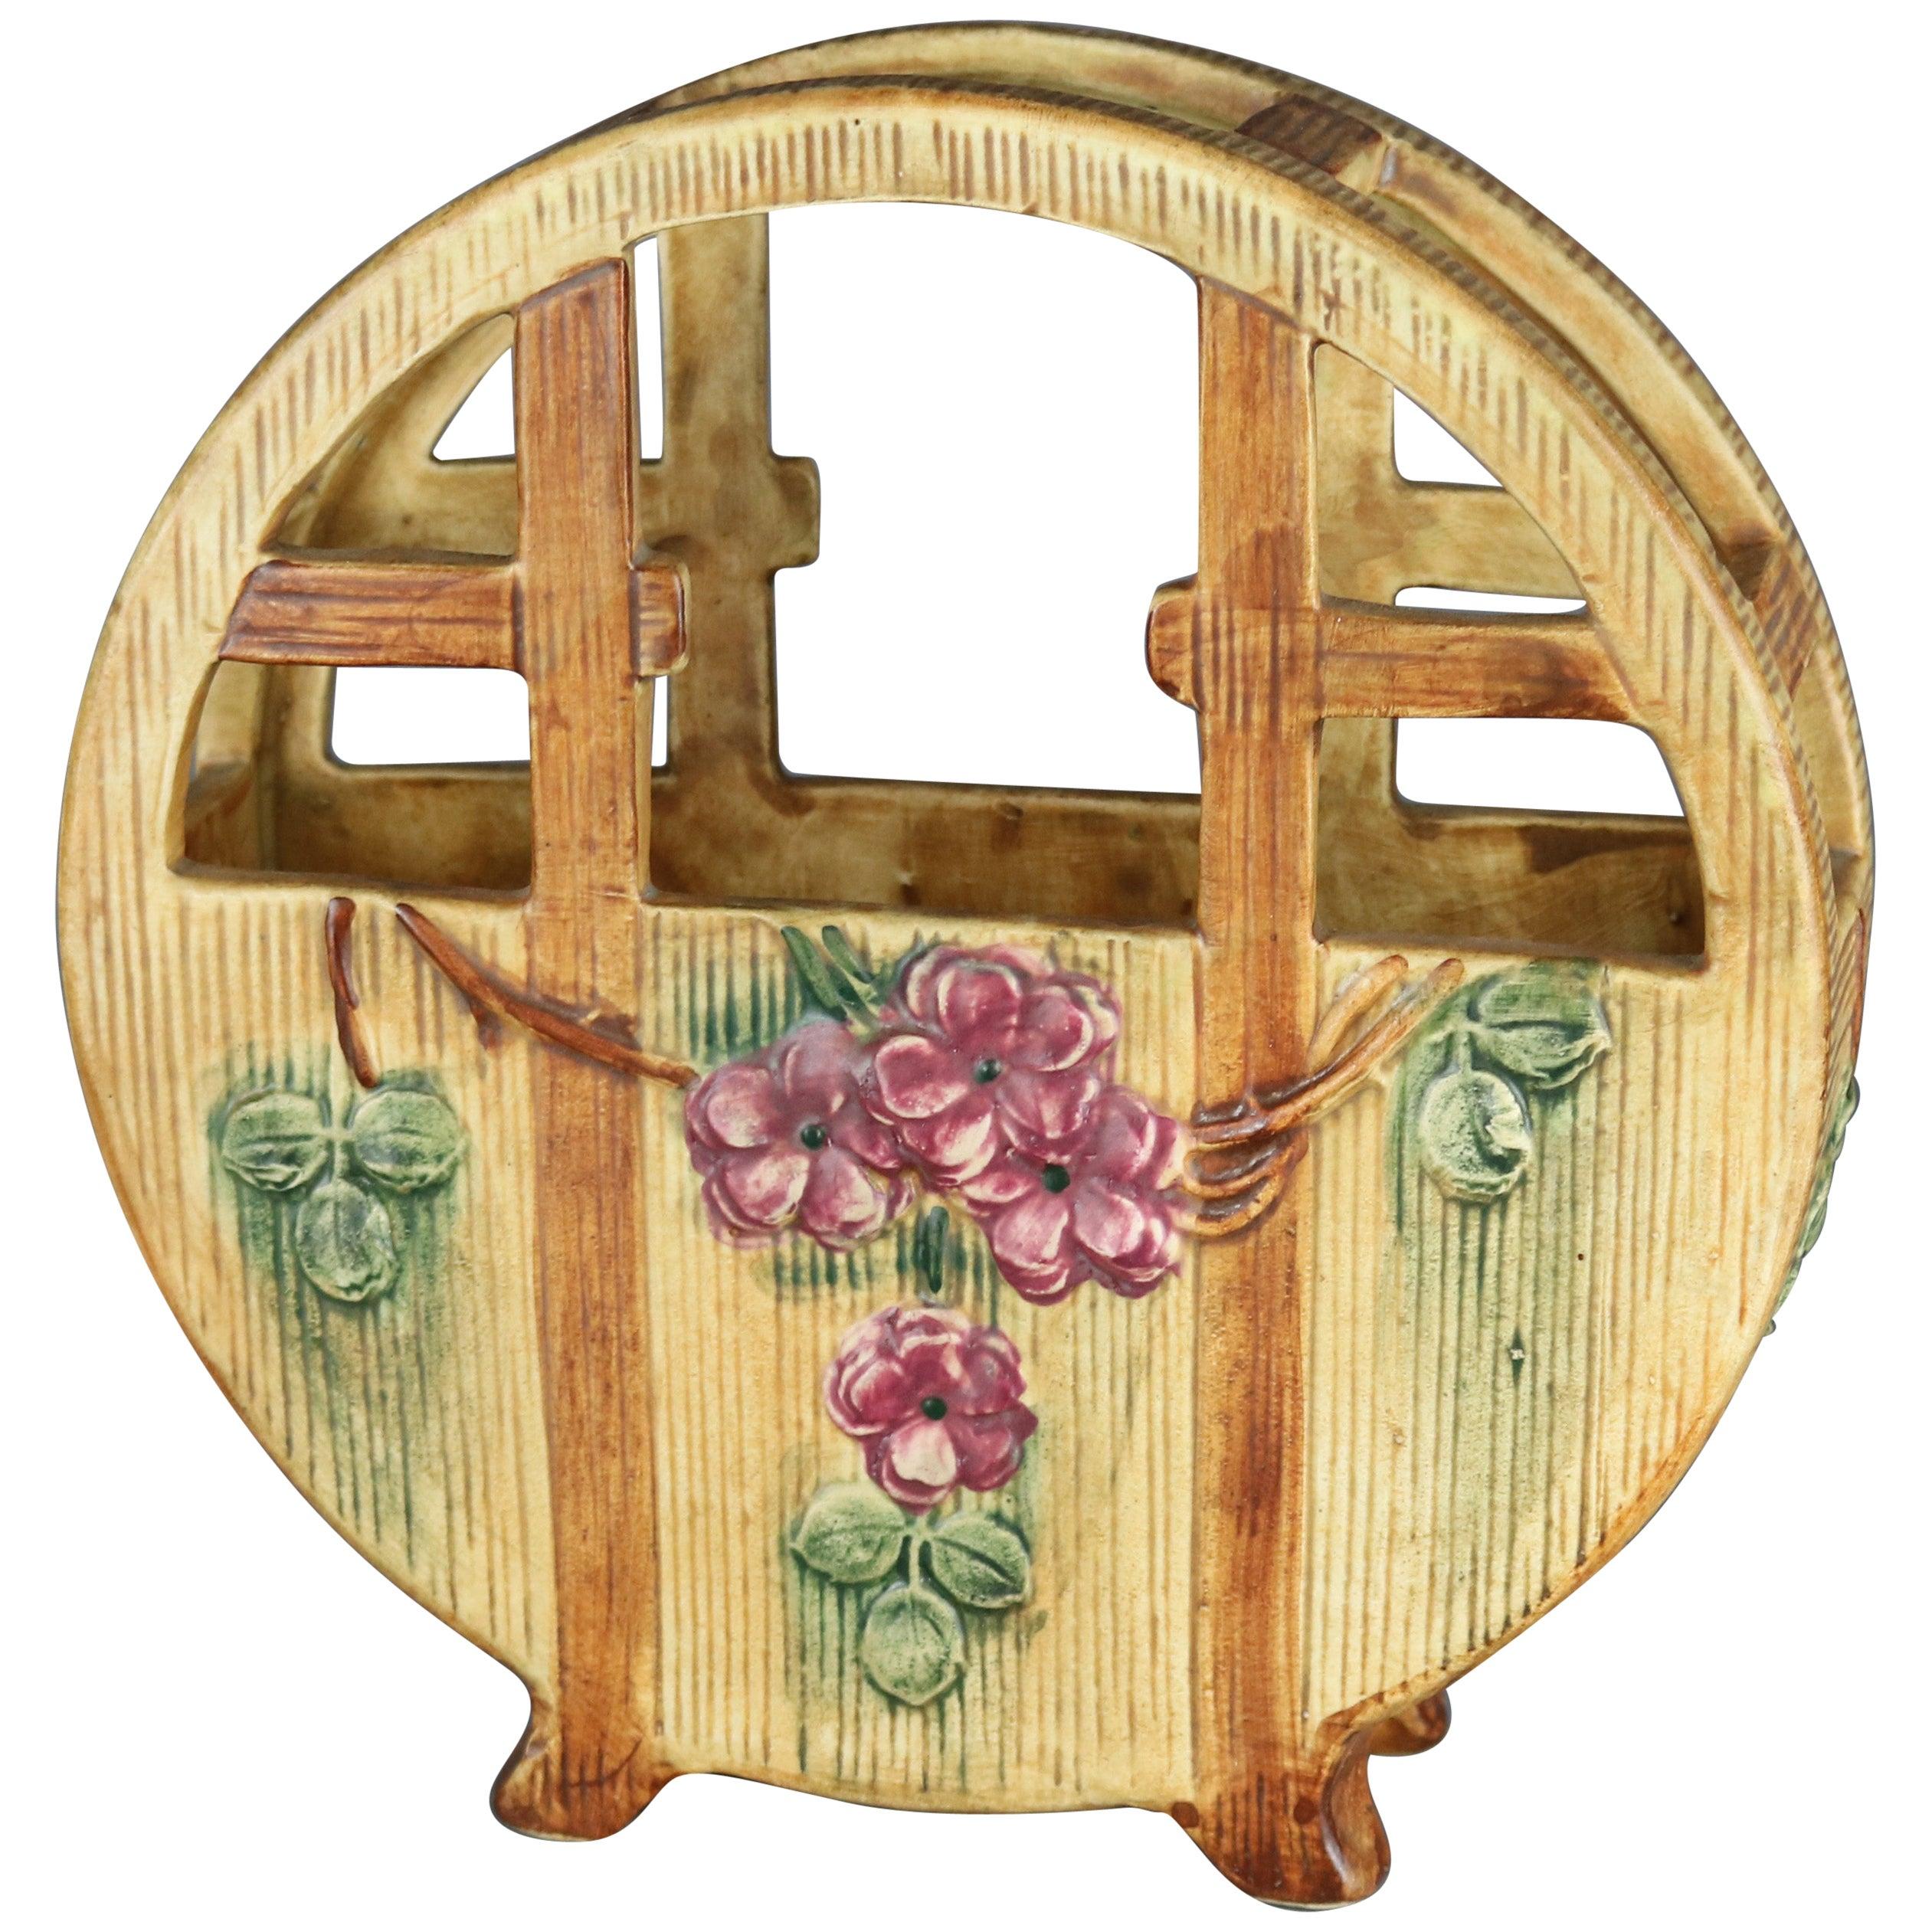 Antique Weller Woodcraft Art Pottery Basket Form Planter, Circa 1930